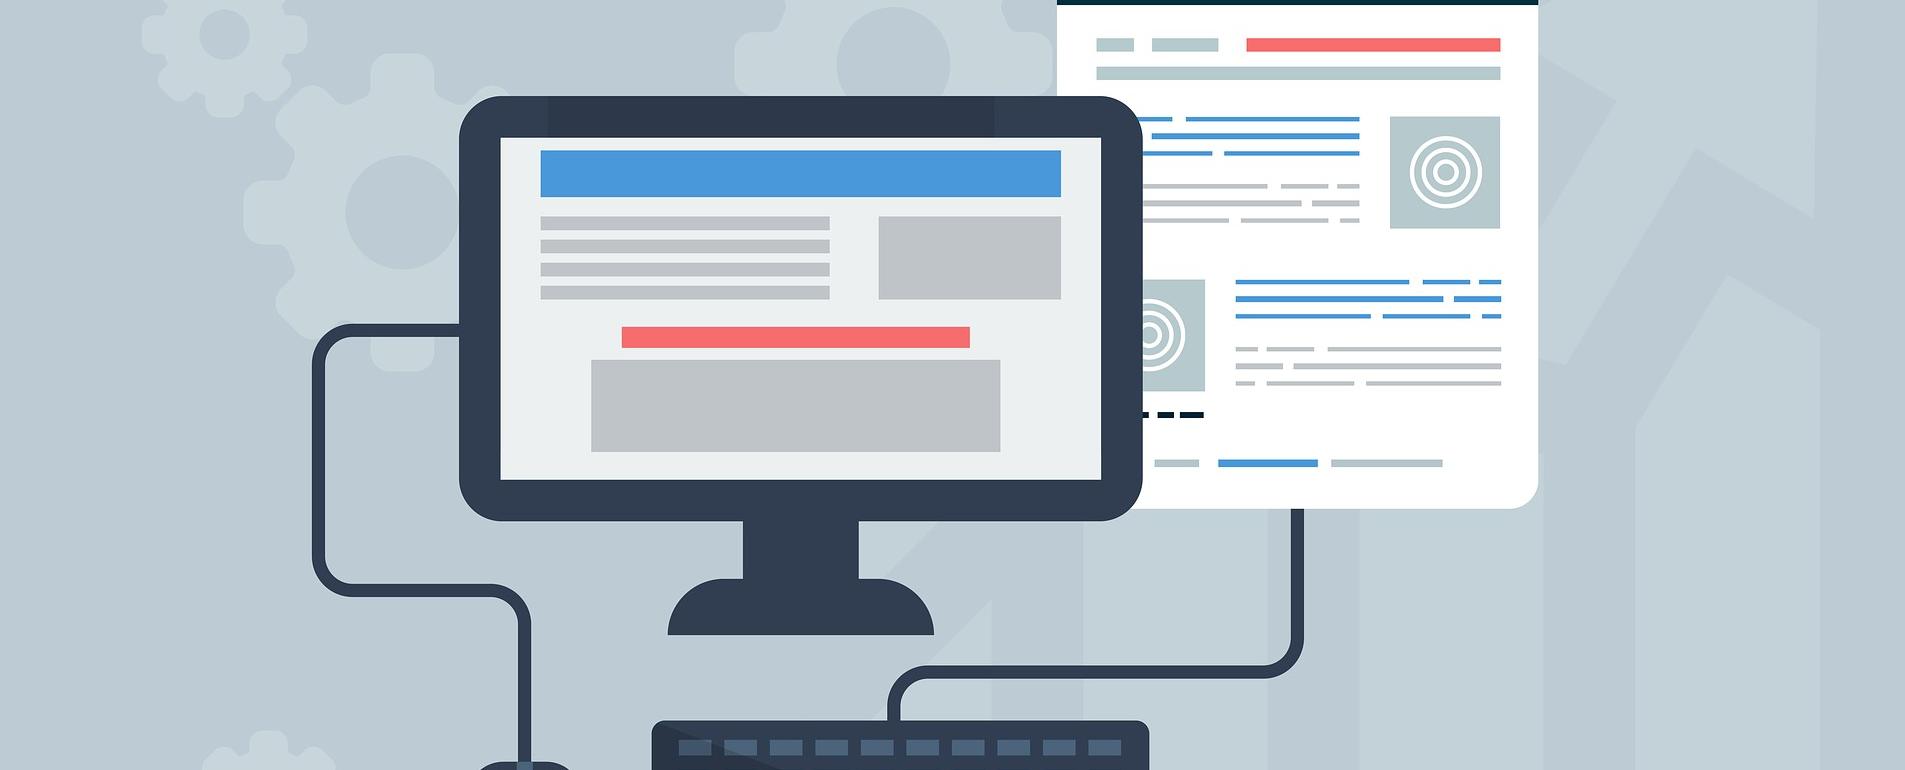 Creating fillable PDFs using JotForm